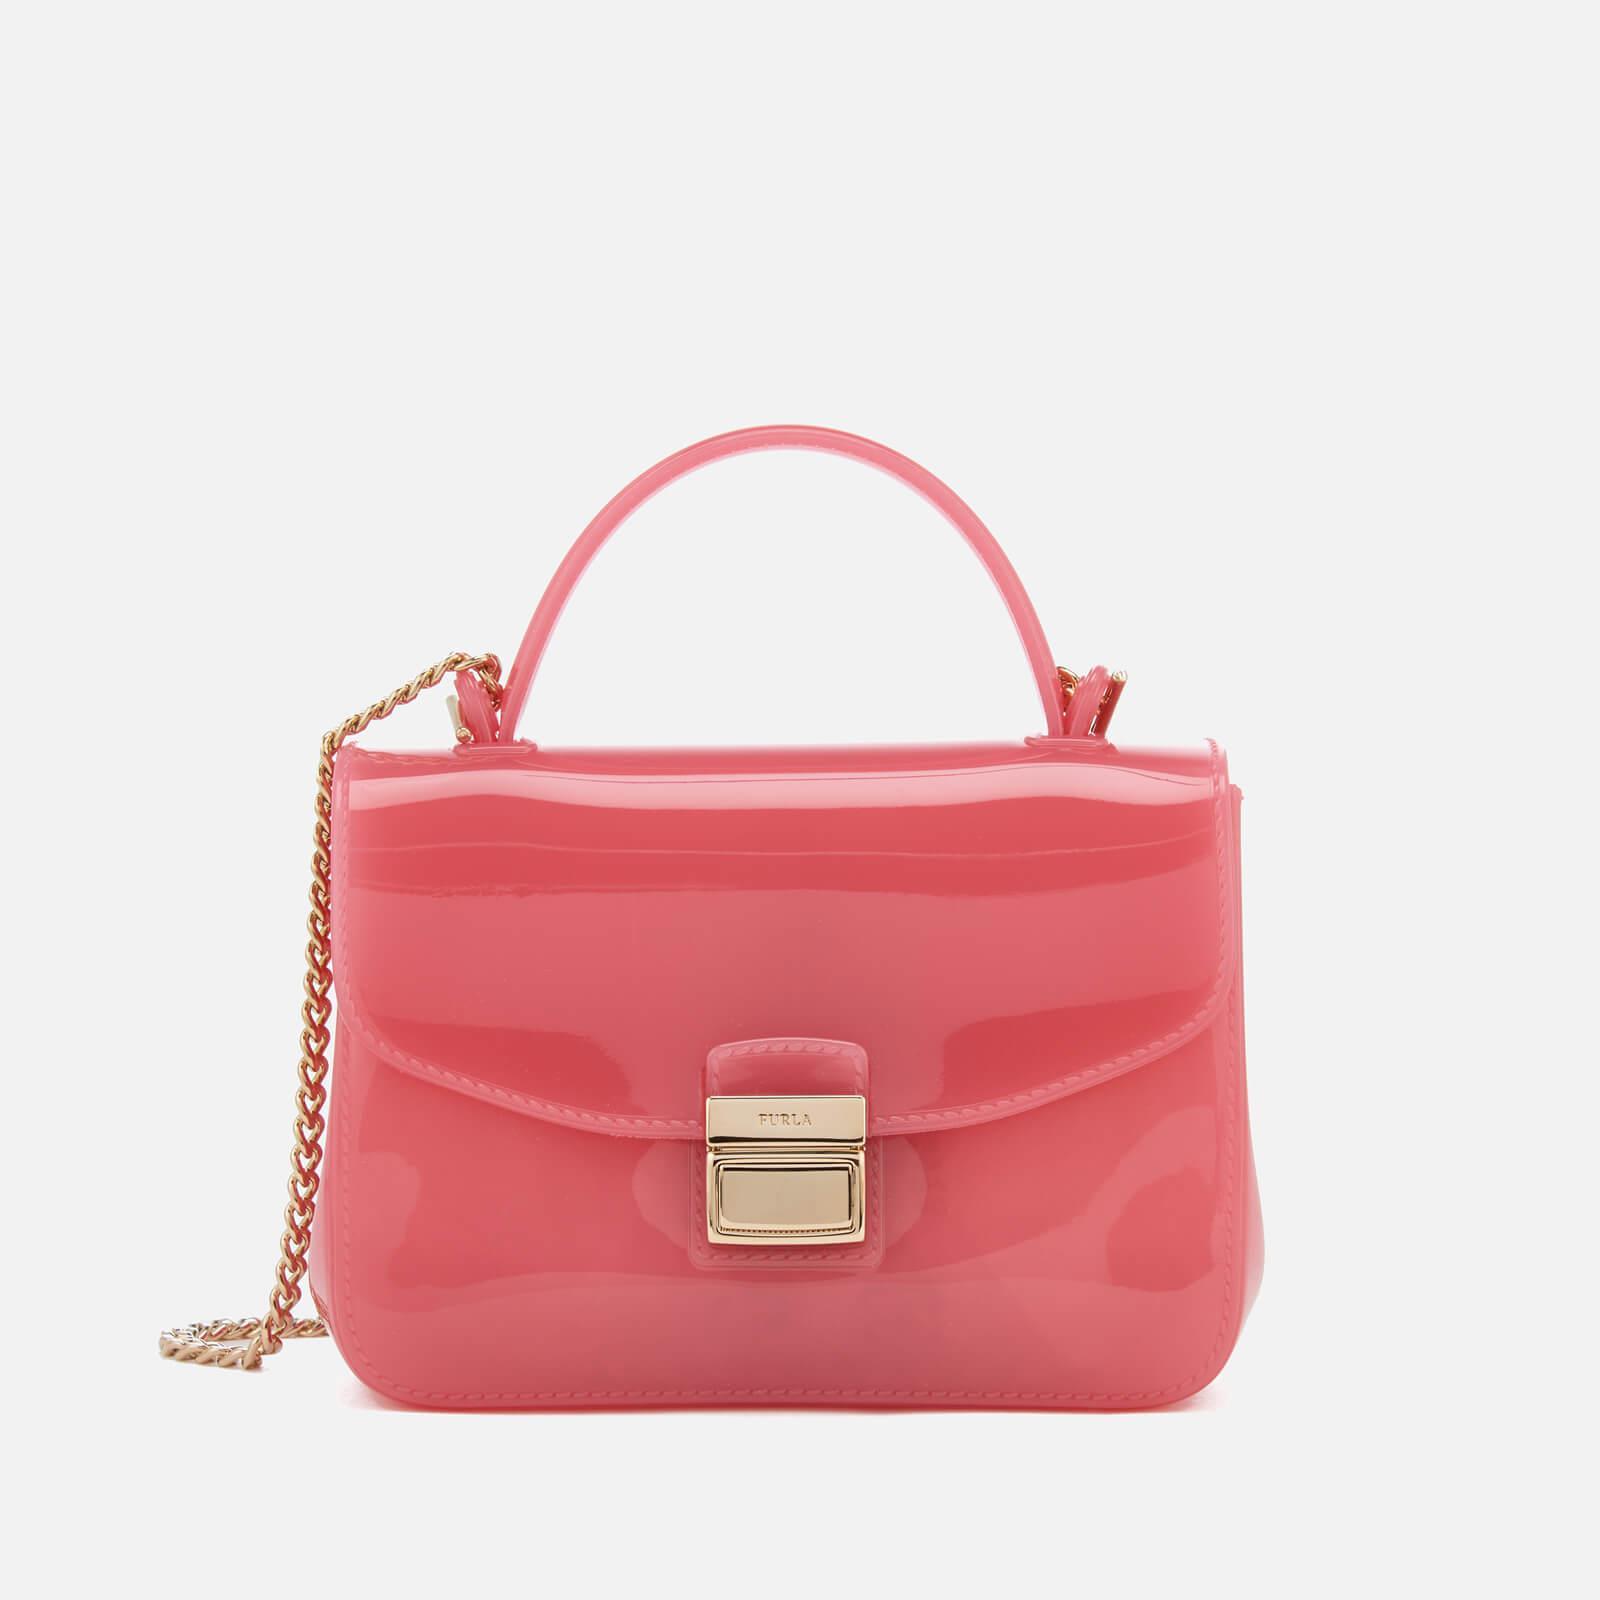 Furla Candy Sugar Mini Cross Body Bag in Pink